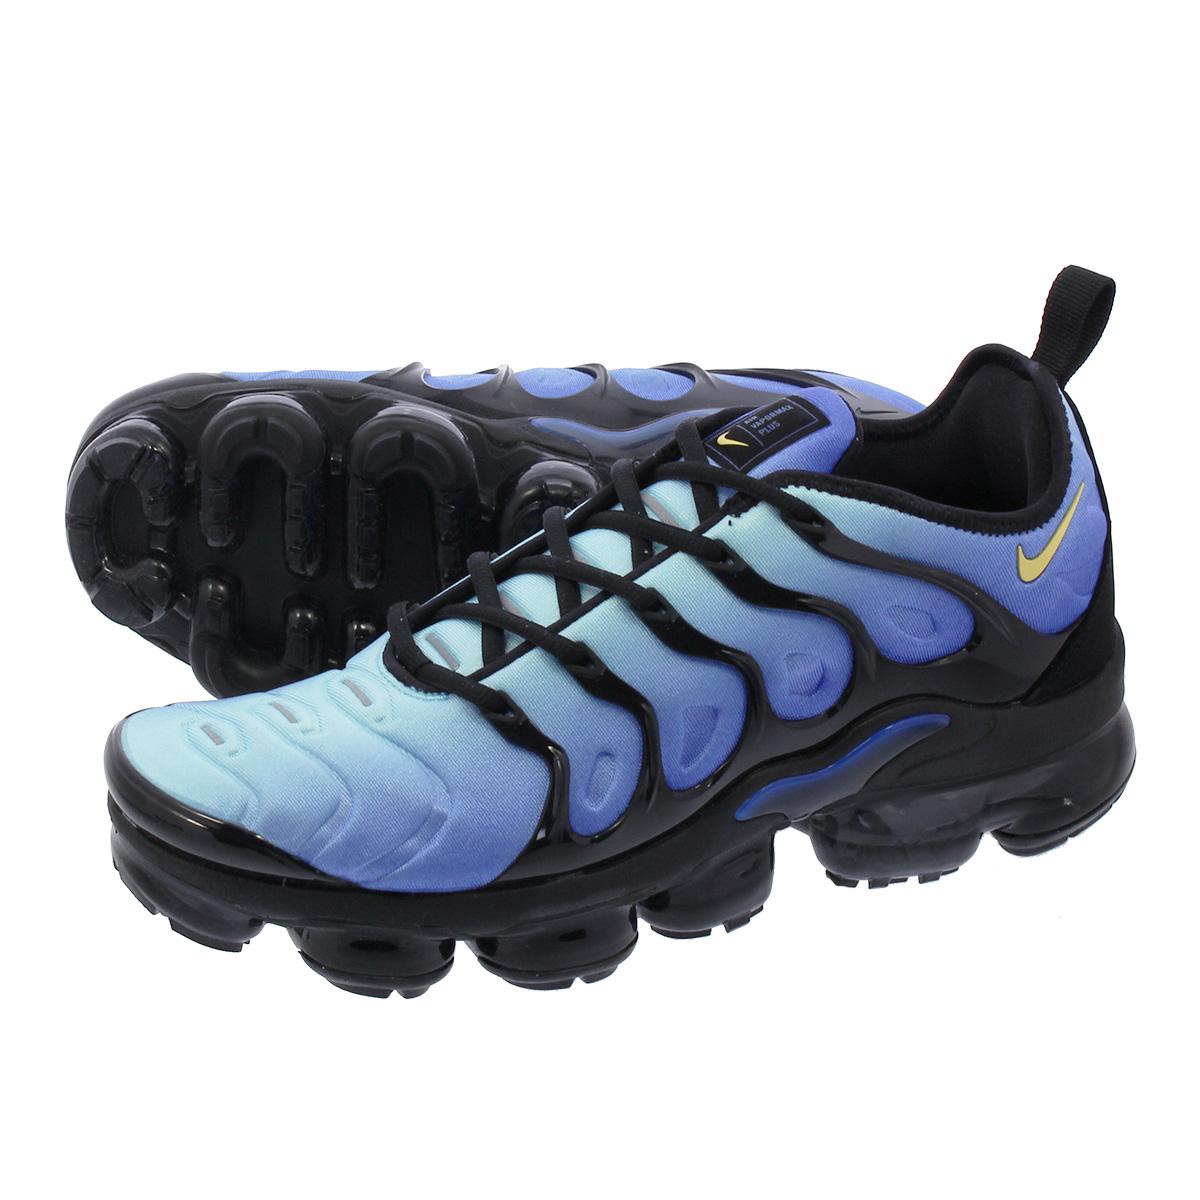 8f412a90c7209 NIKE AIR VAPORMAX PLUS Nike vapor max plus BLACK CHAMPOIS HYPER BLUE  924